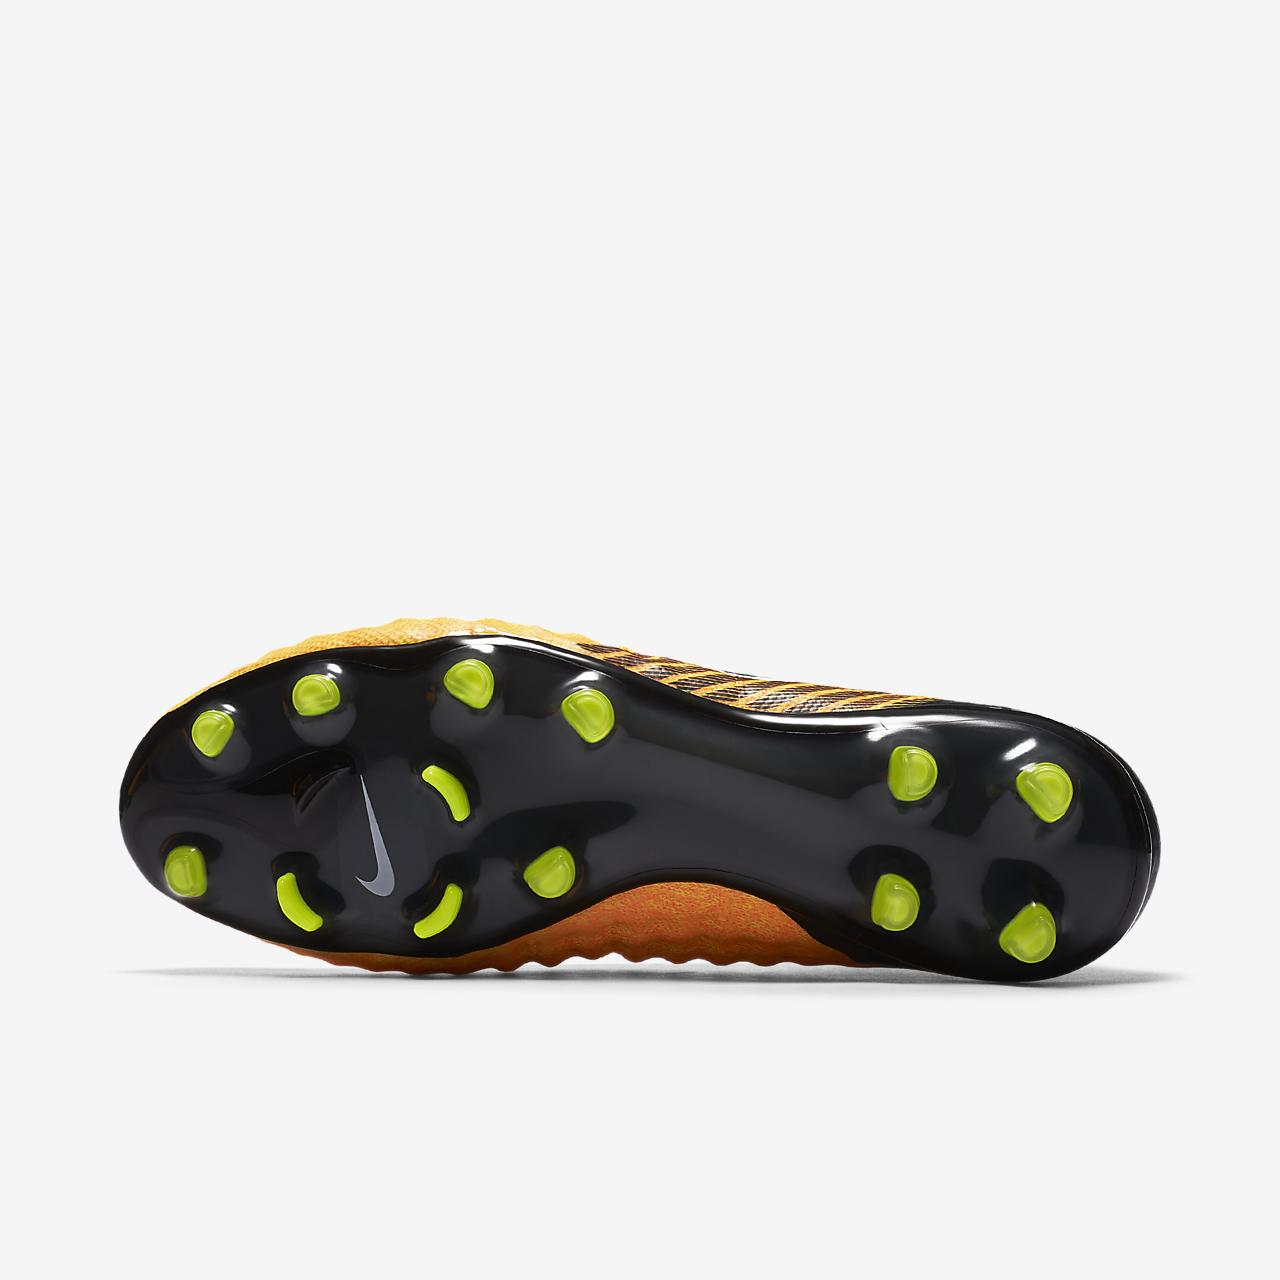 Nike Magista Orden II DF SG (Men's) Best Price Compare